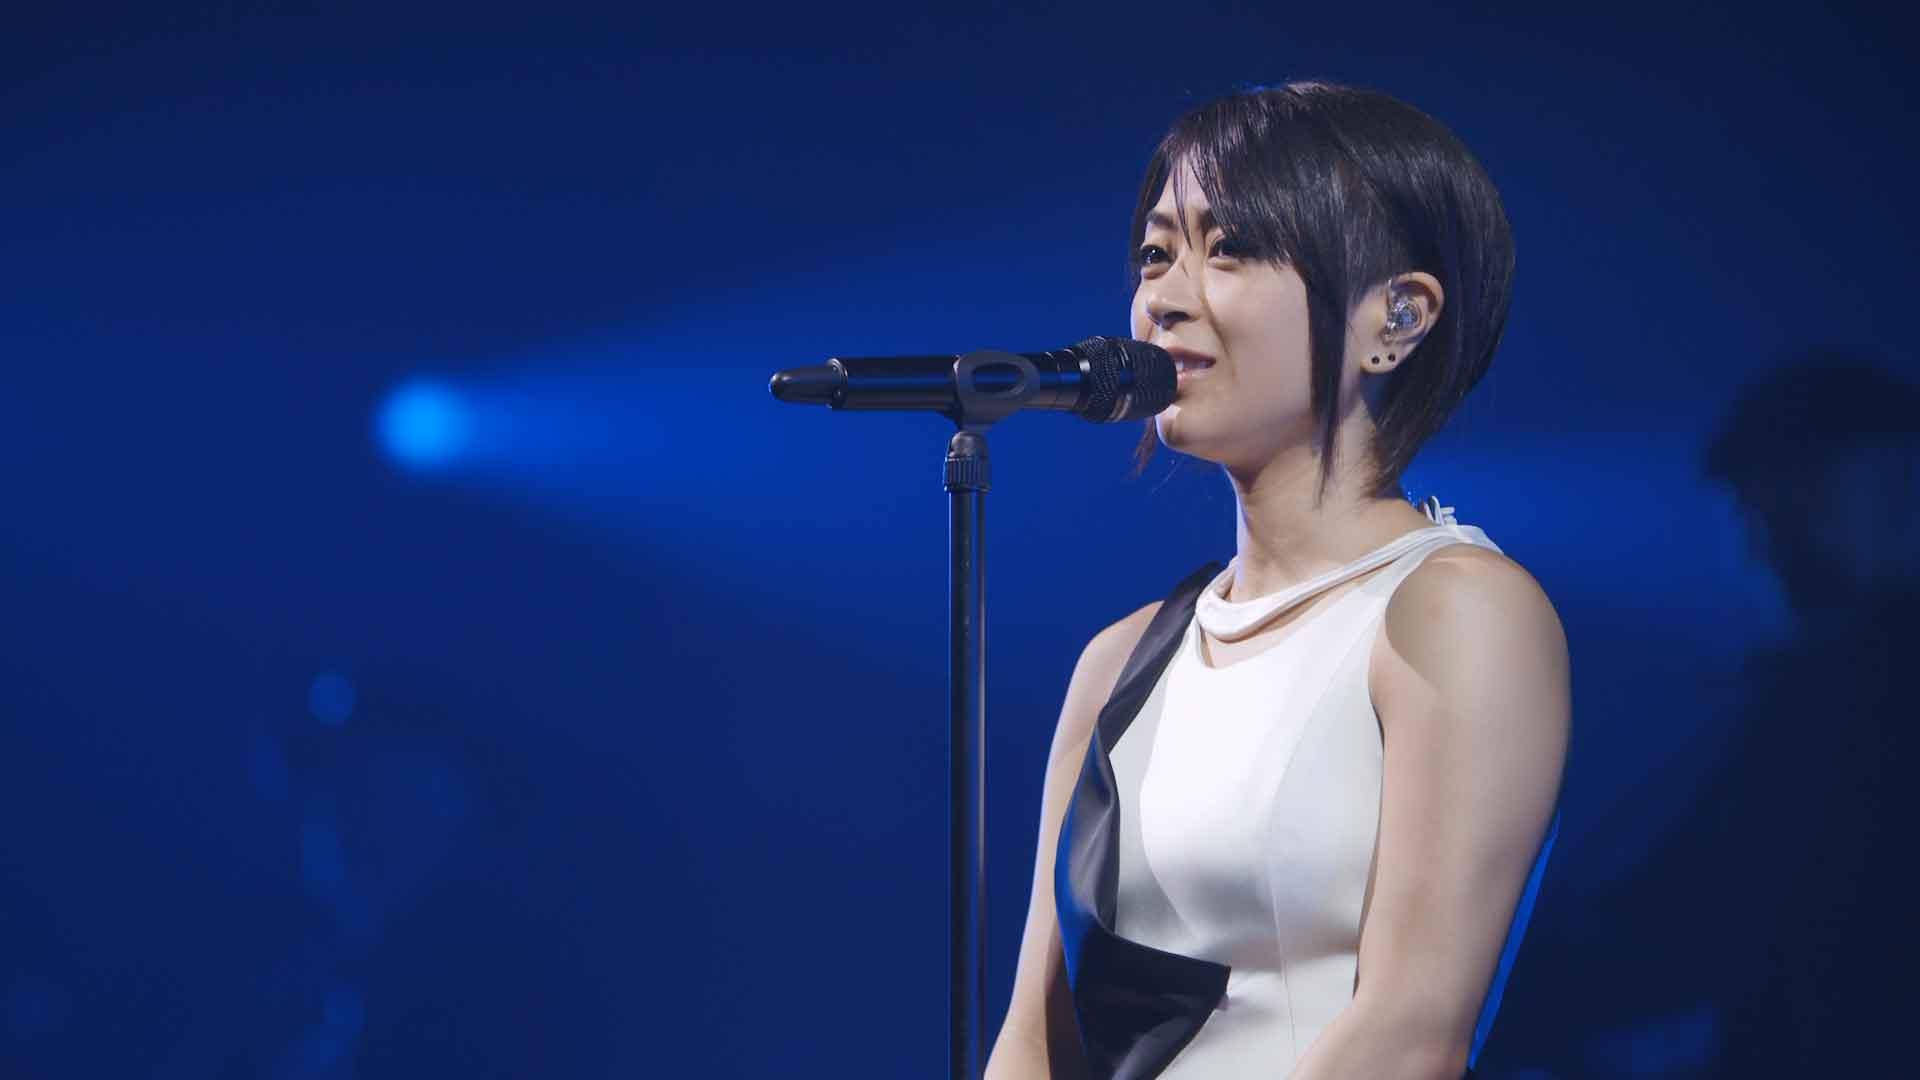 [蓝光原盘] 宇多田光2018千叶幕张演唱会Hikaru Utada Laughter in the Dark Tour 2018《ISO 43.6G》